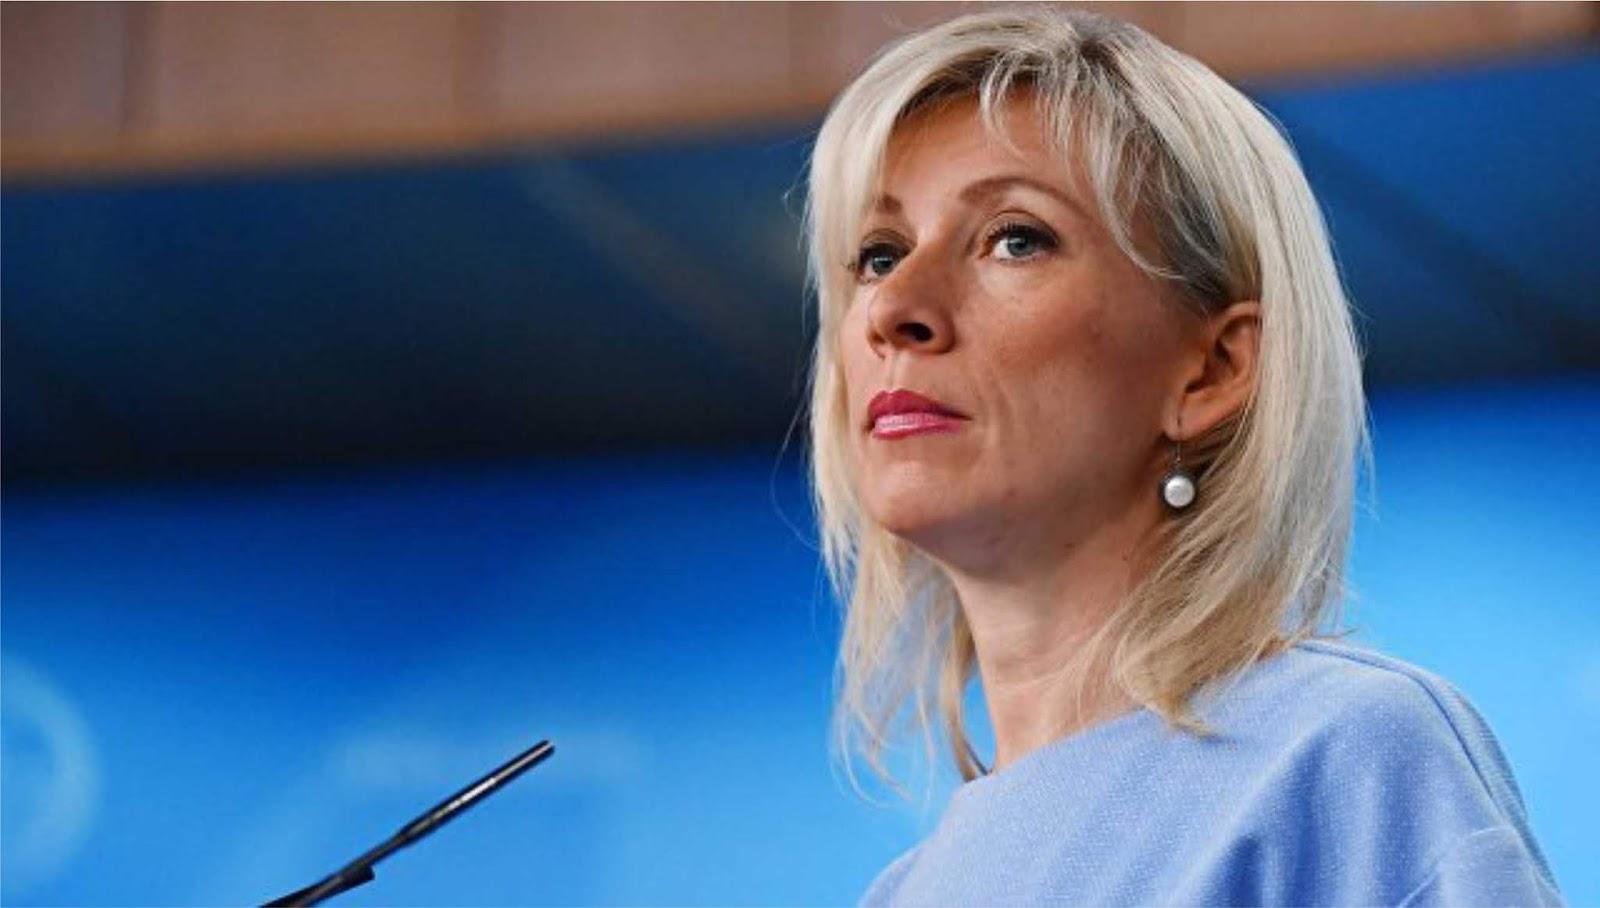 Rusia menanggapi ancaman Menlu Inggis dan mengatakan itu retorika sesat